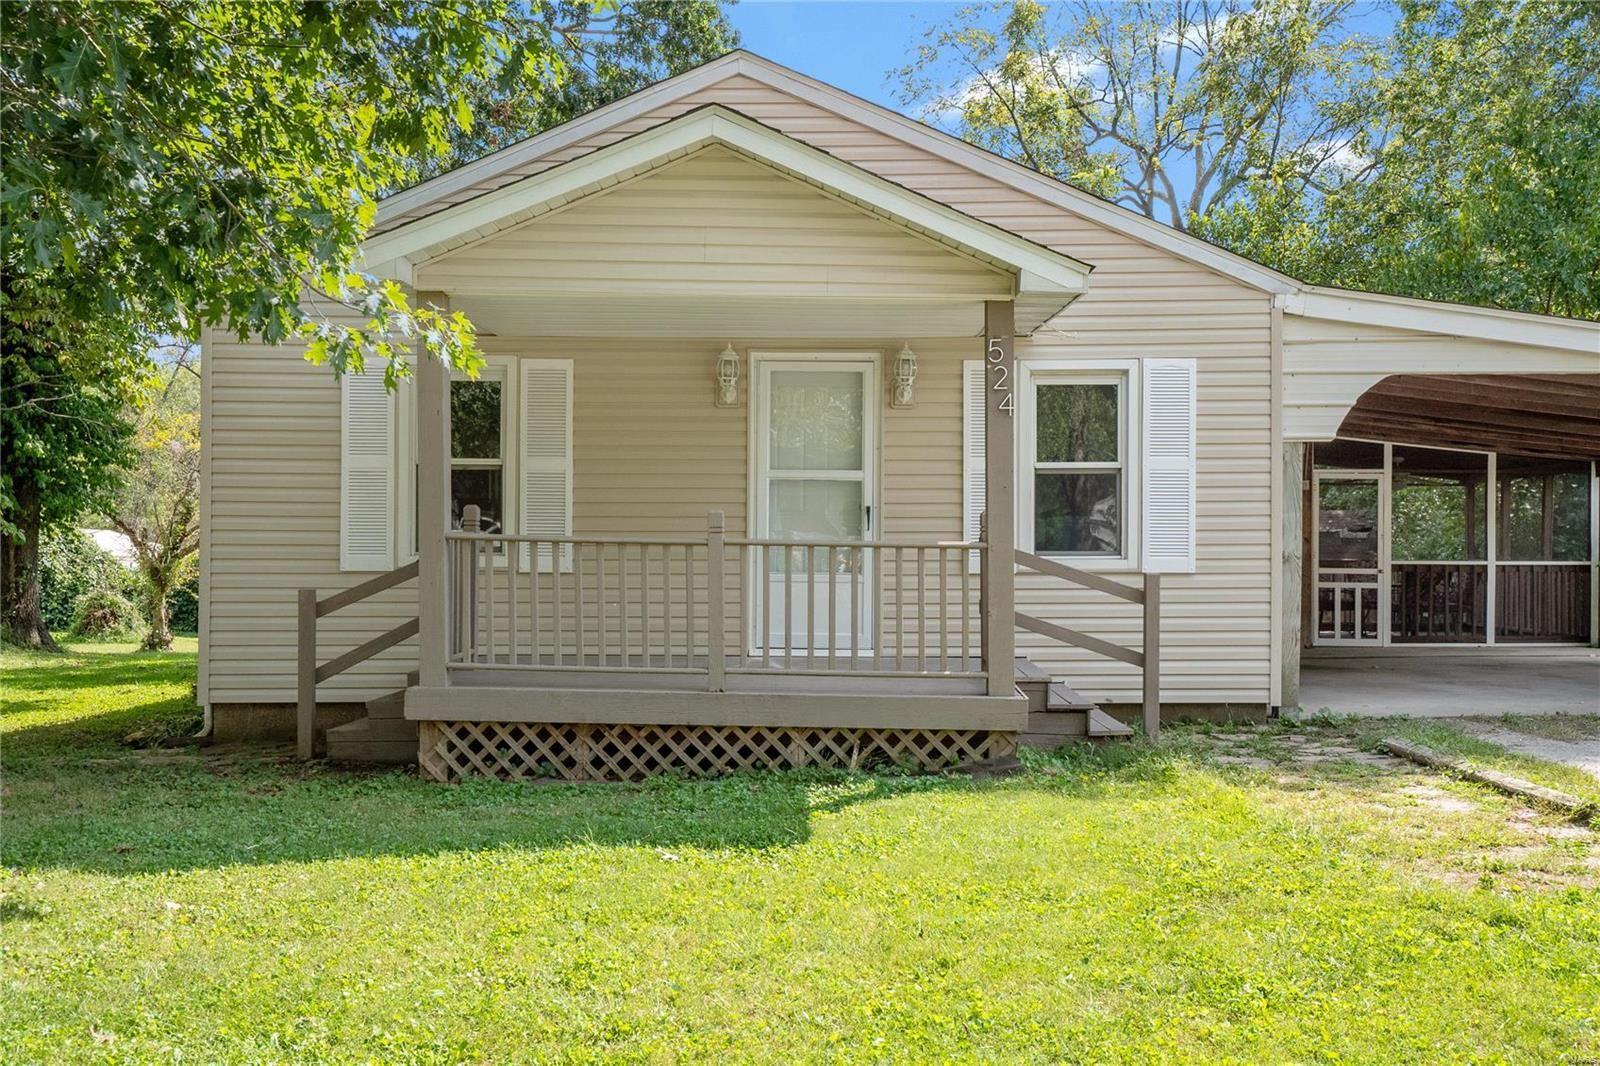 524 Belvedere, Belleville, IL 62223 - MLS#: 21066164